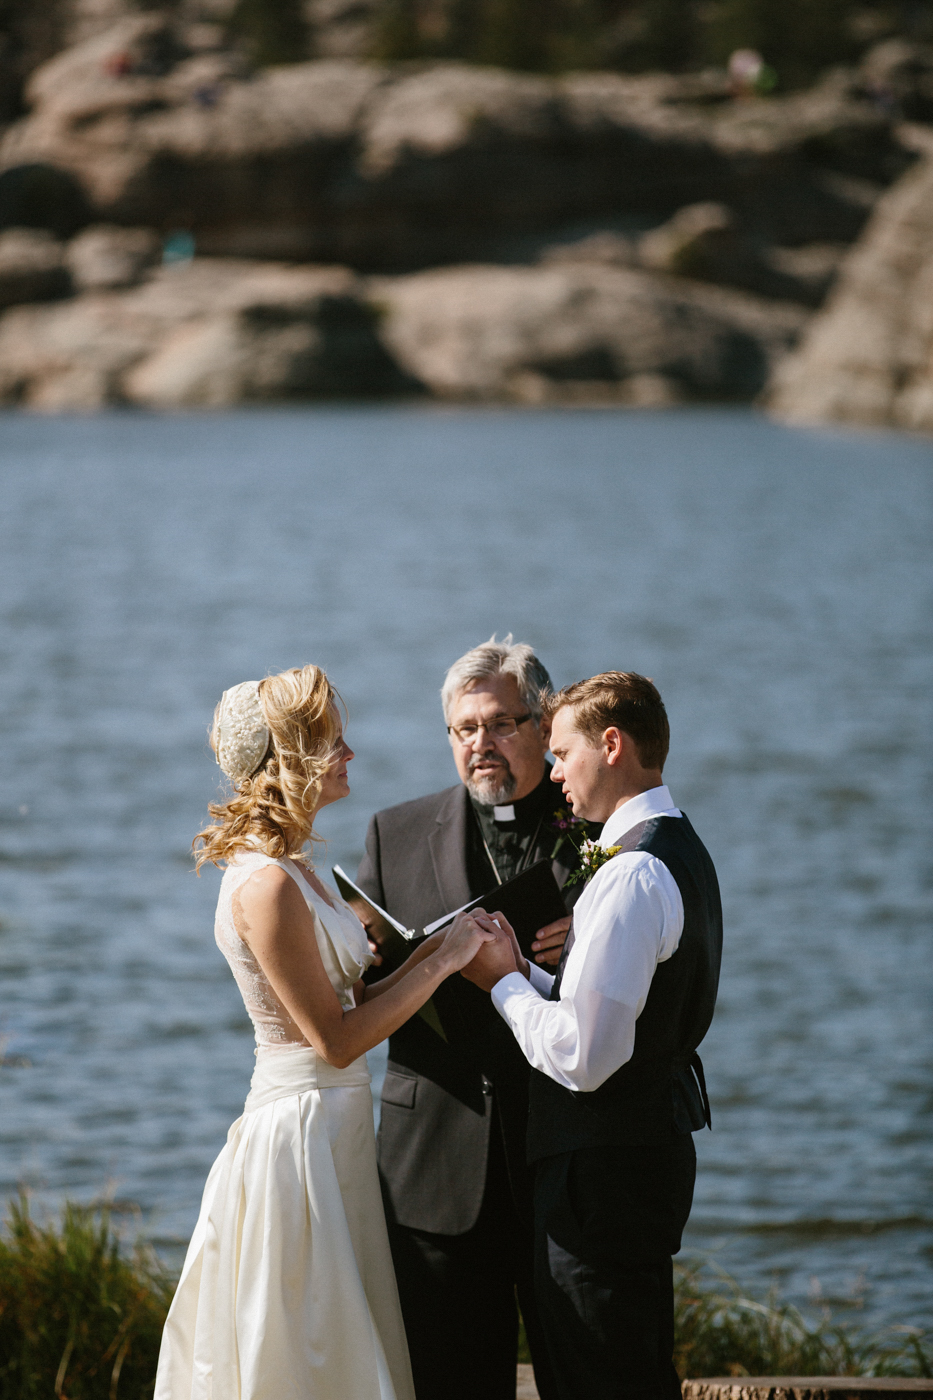 SouthDakota-Iowa-Destination-Wedding-Photographer_079.jpg